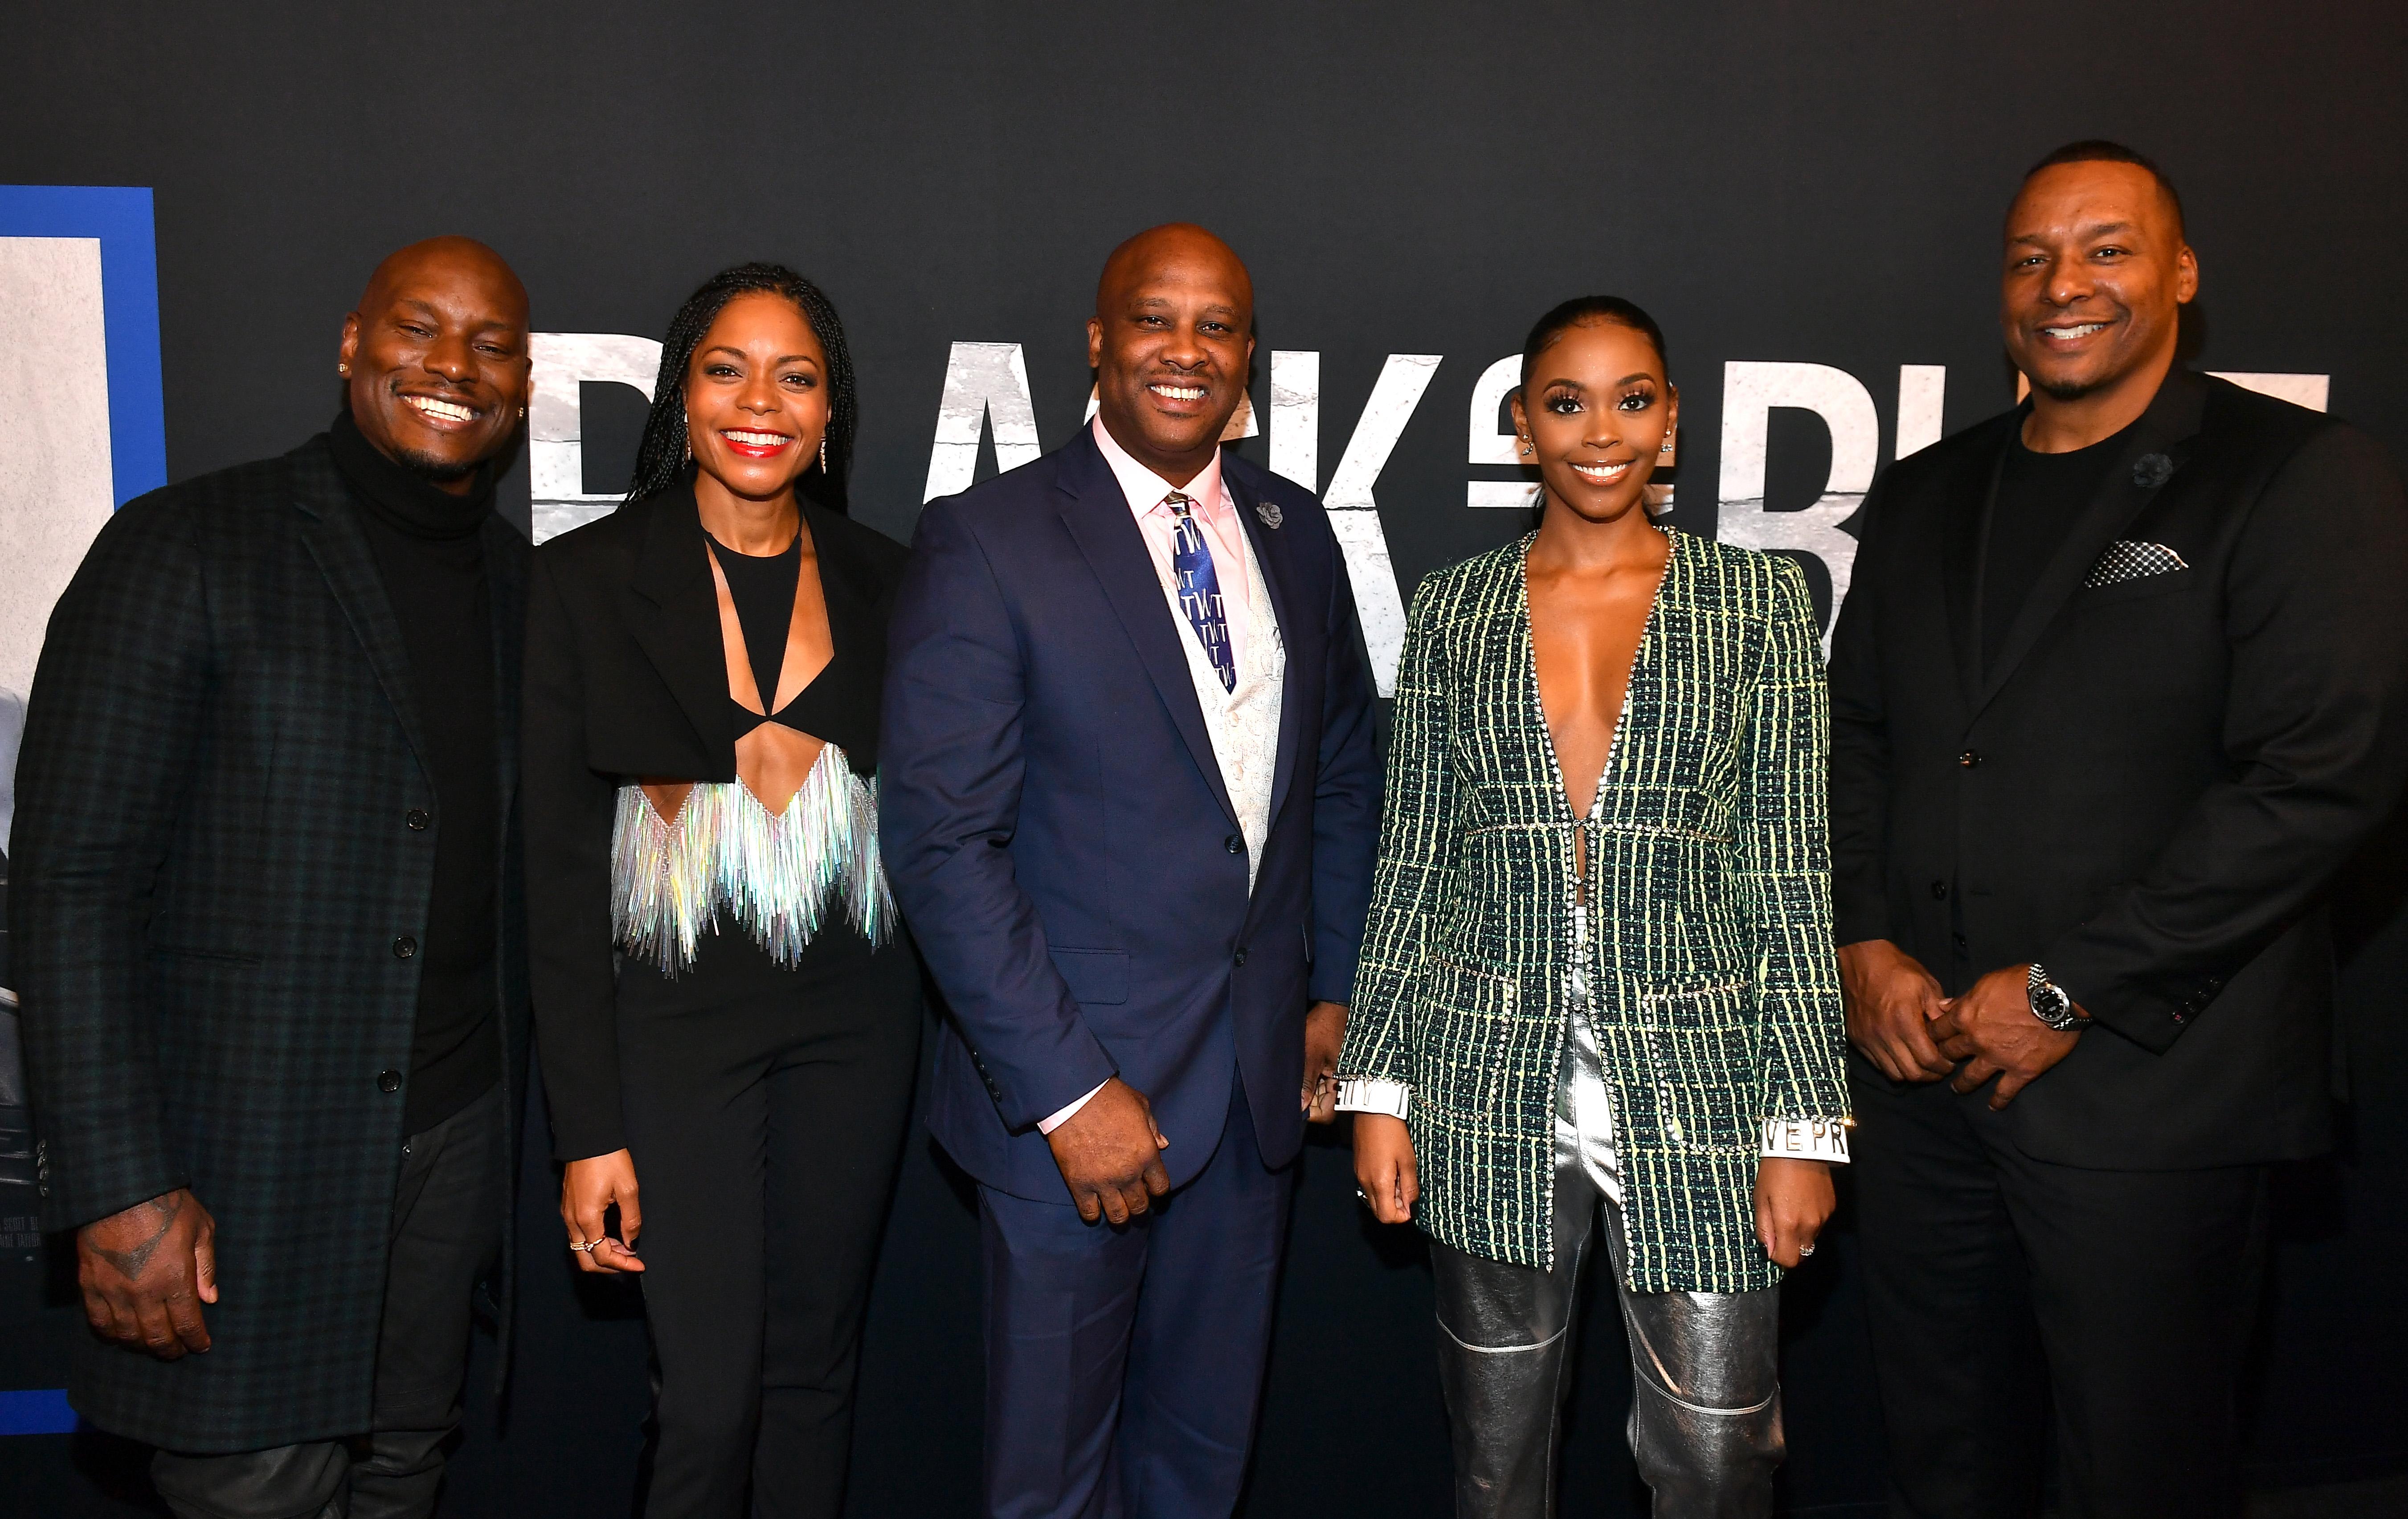 Black And Blue Movie Premiere In Atlanta